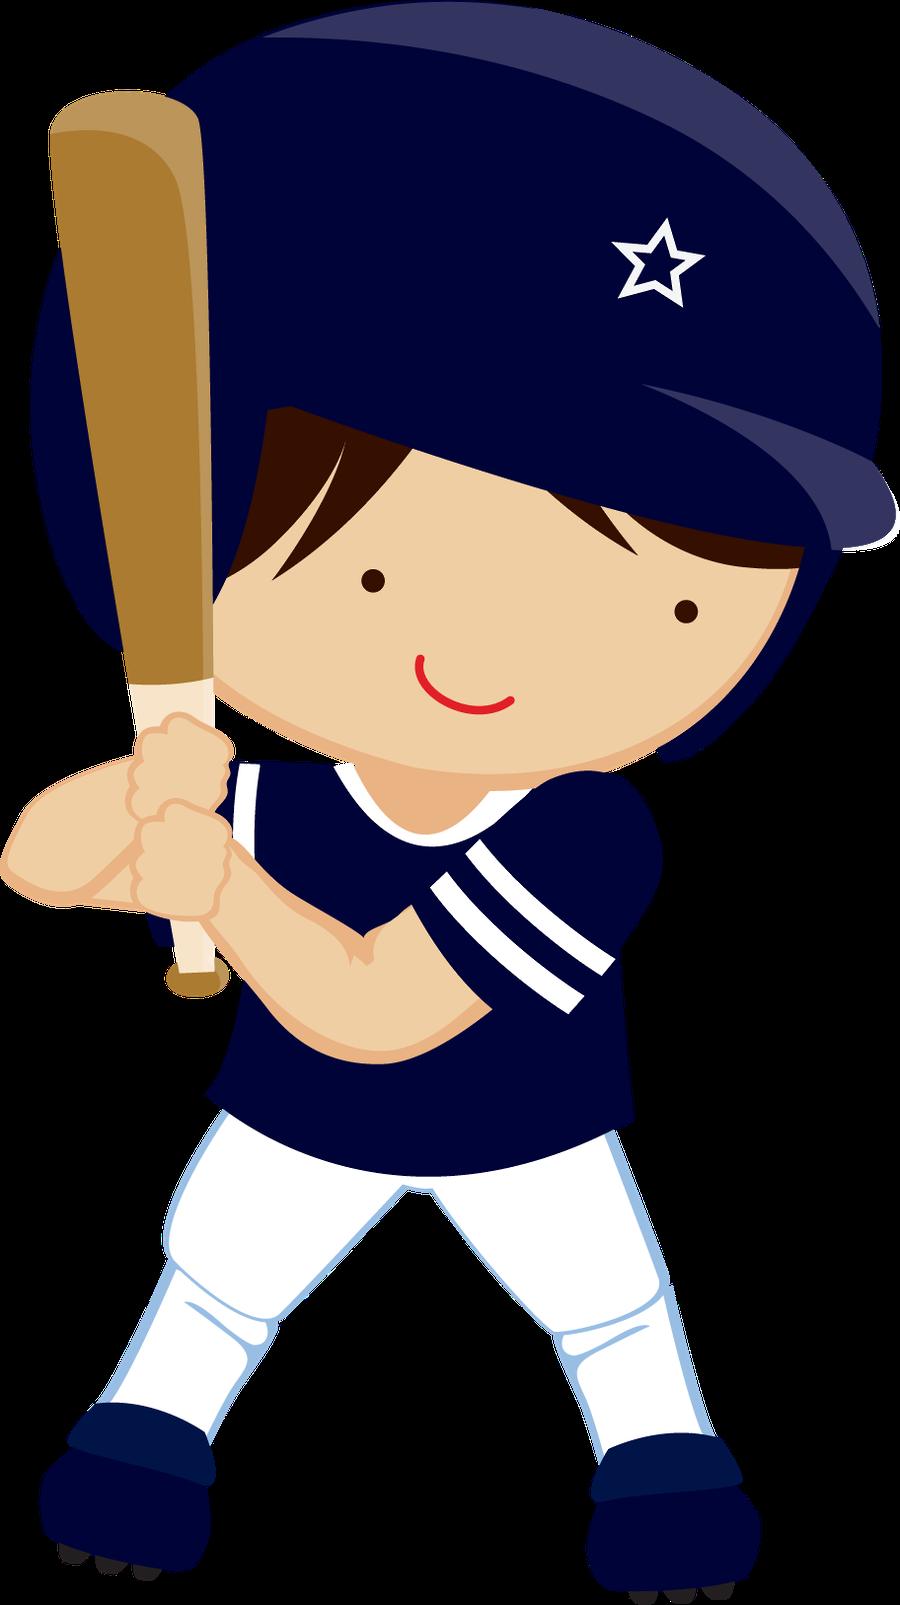 Boys Baseball Png & Free Boys Baseball.png Transparent Images #3823.